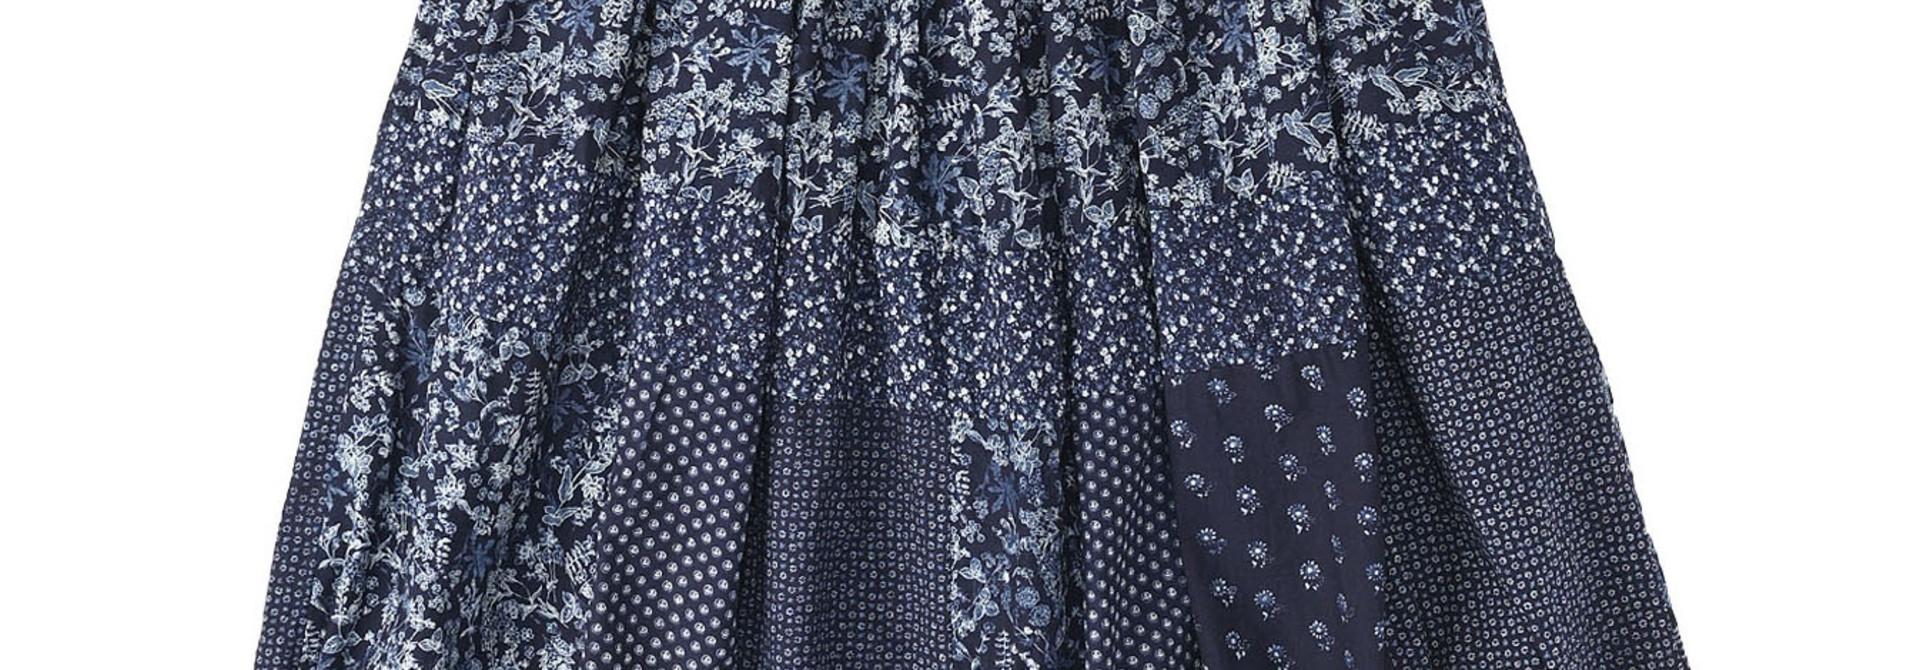 Indigo Tappet Flower Patchwork Skirt